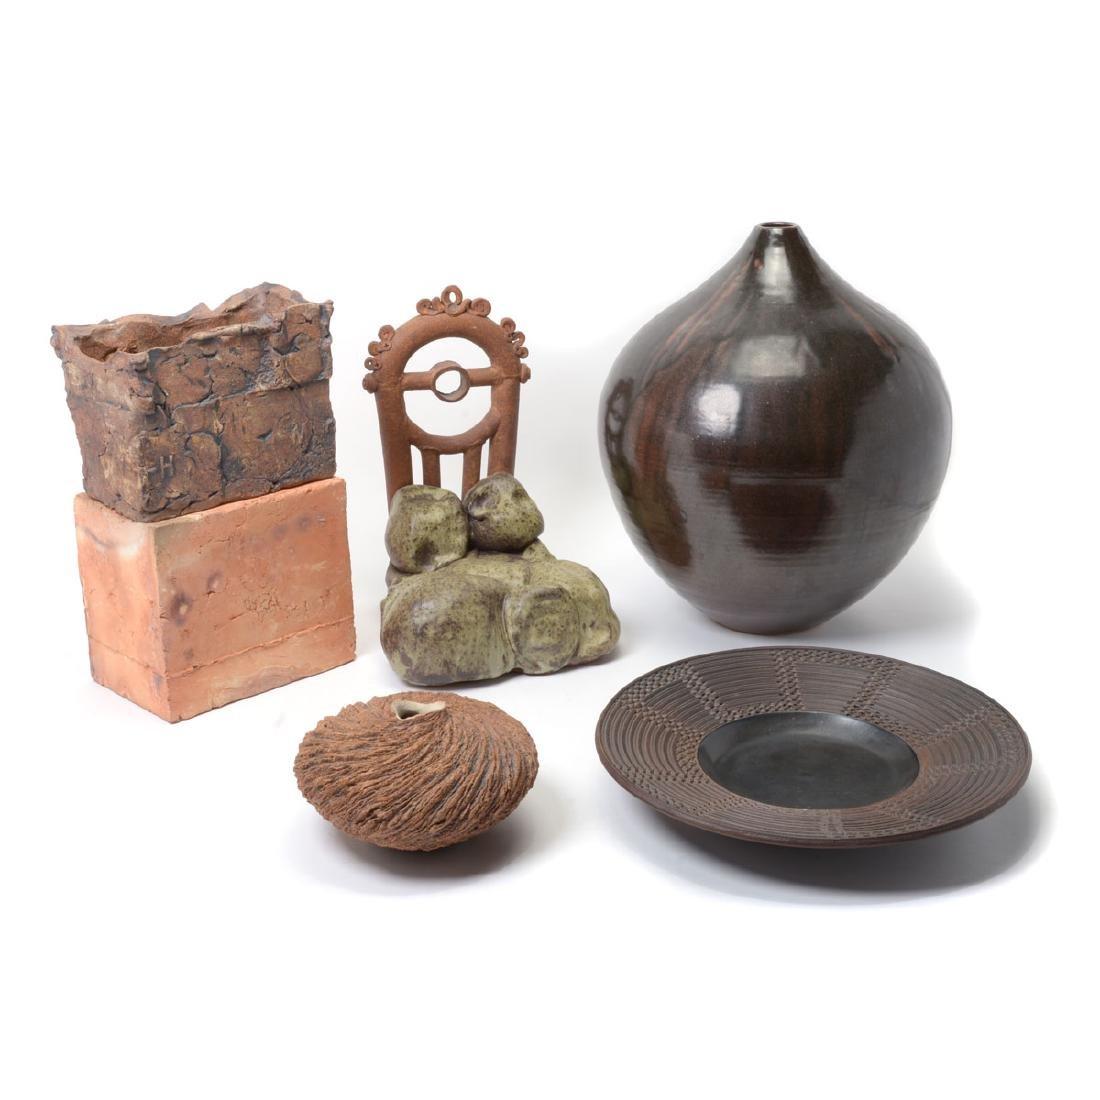 Five Ceramic Studio Pottery Pieces.